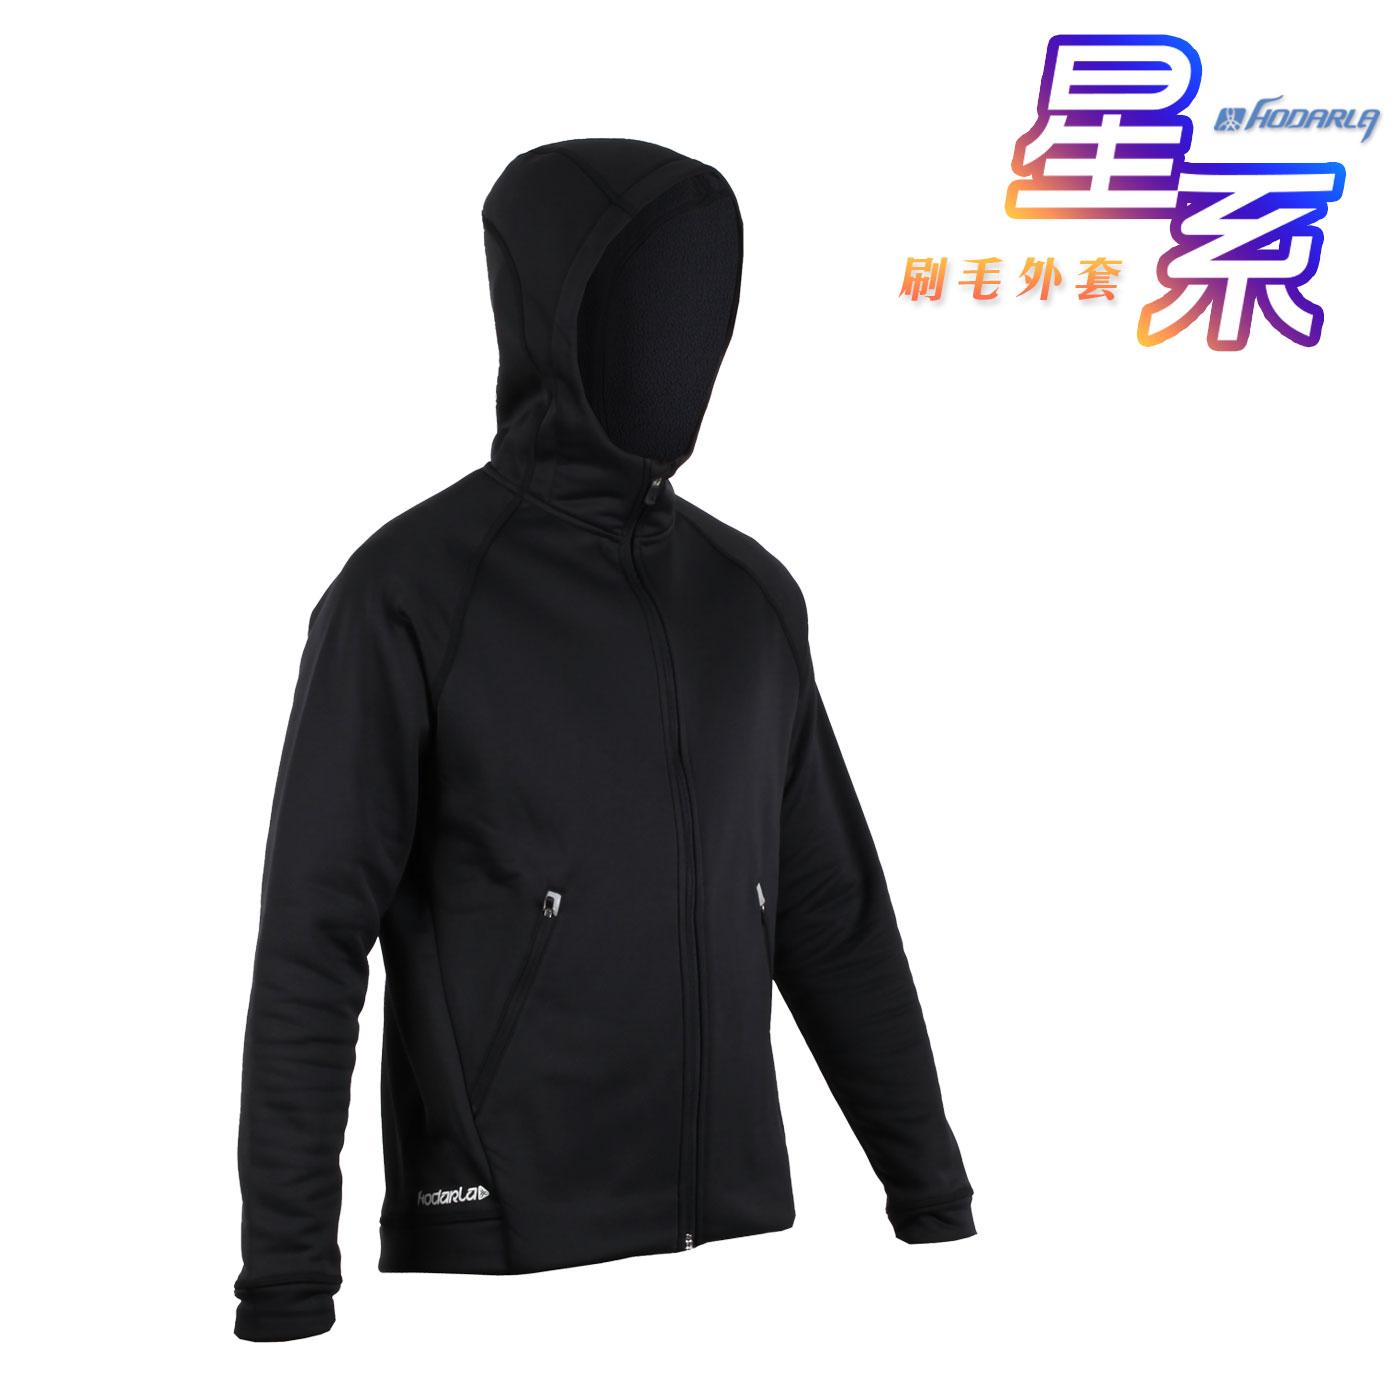 HODARLA 男-星系刷毛外套 3141101 - 黑